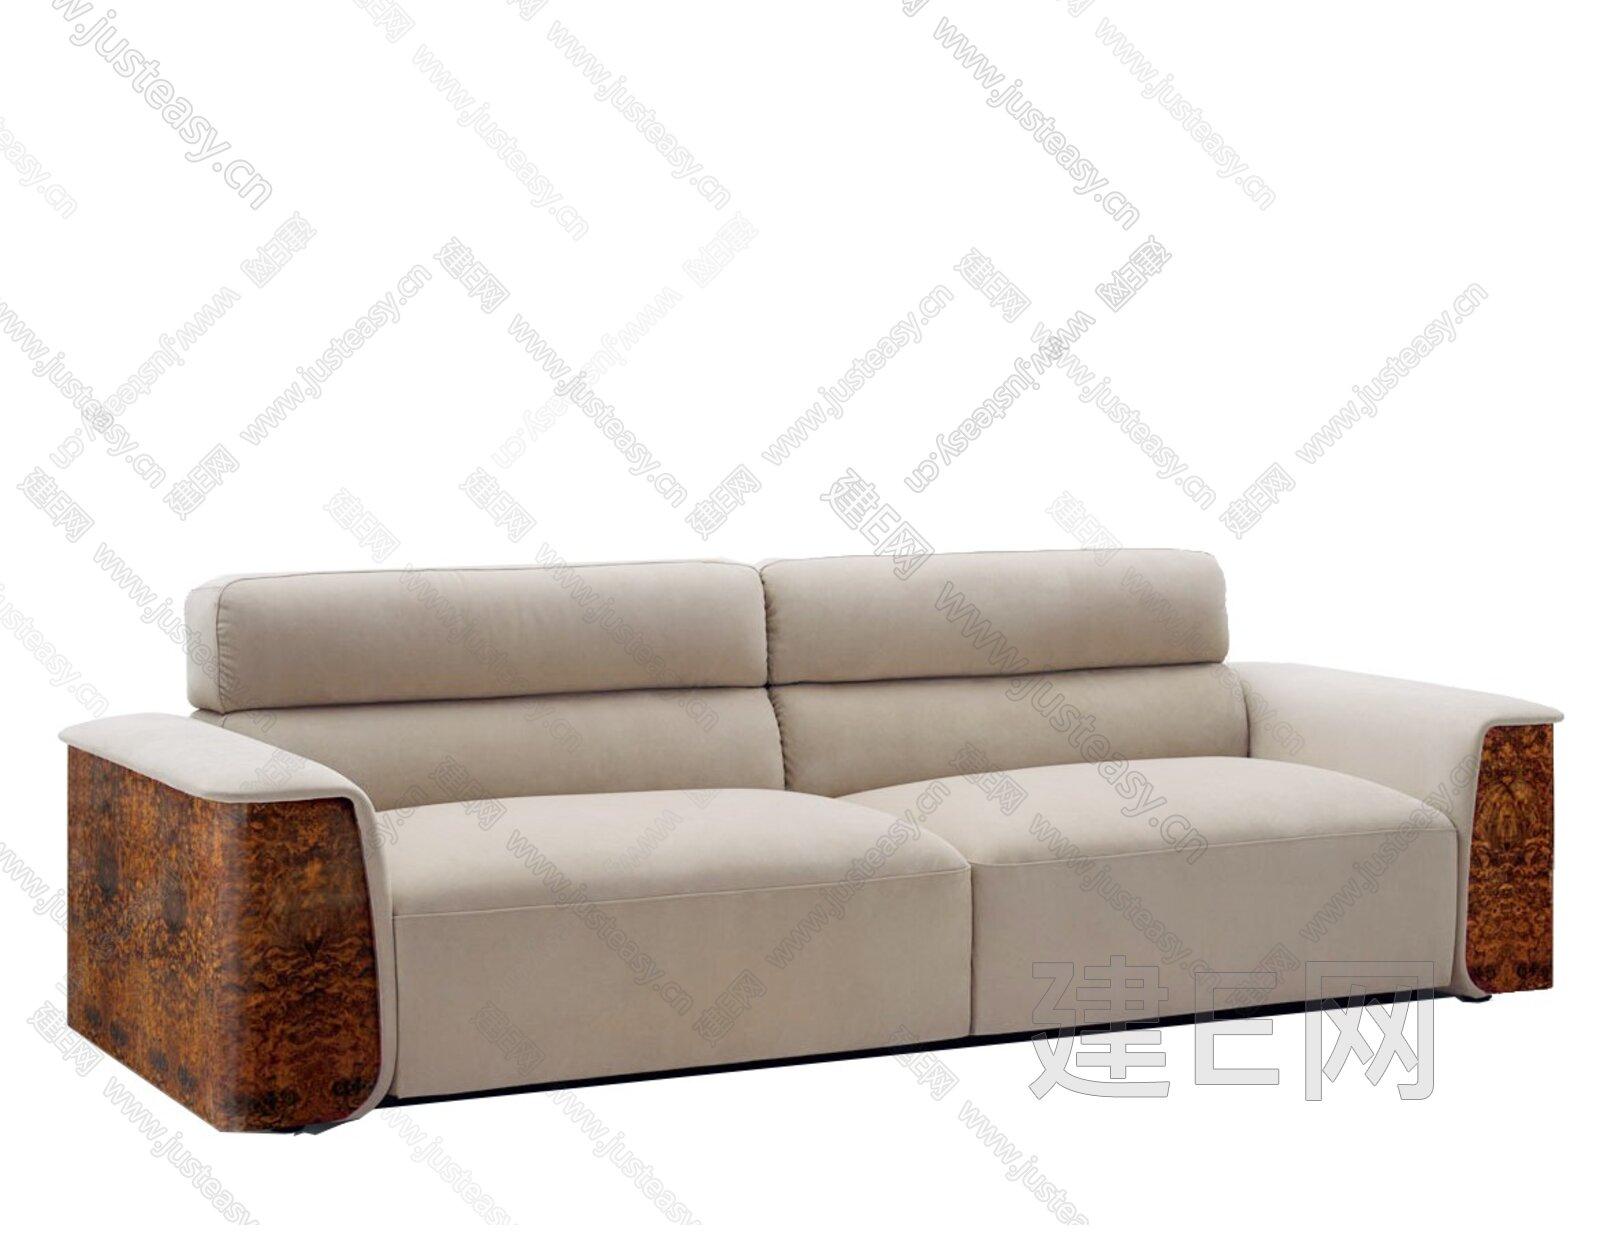 Bentley 宾利 现代多人沙发3d模型